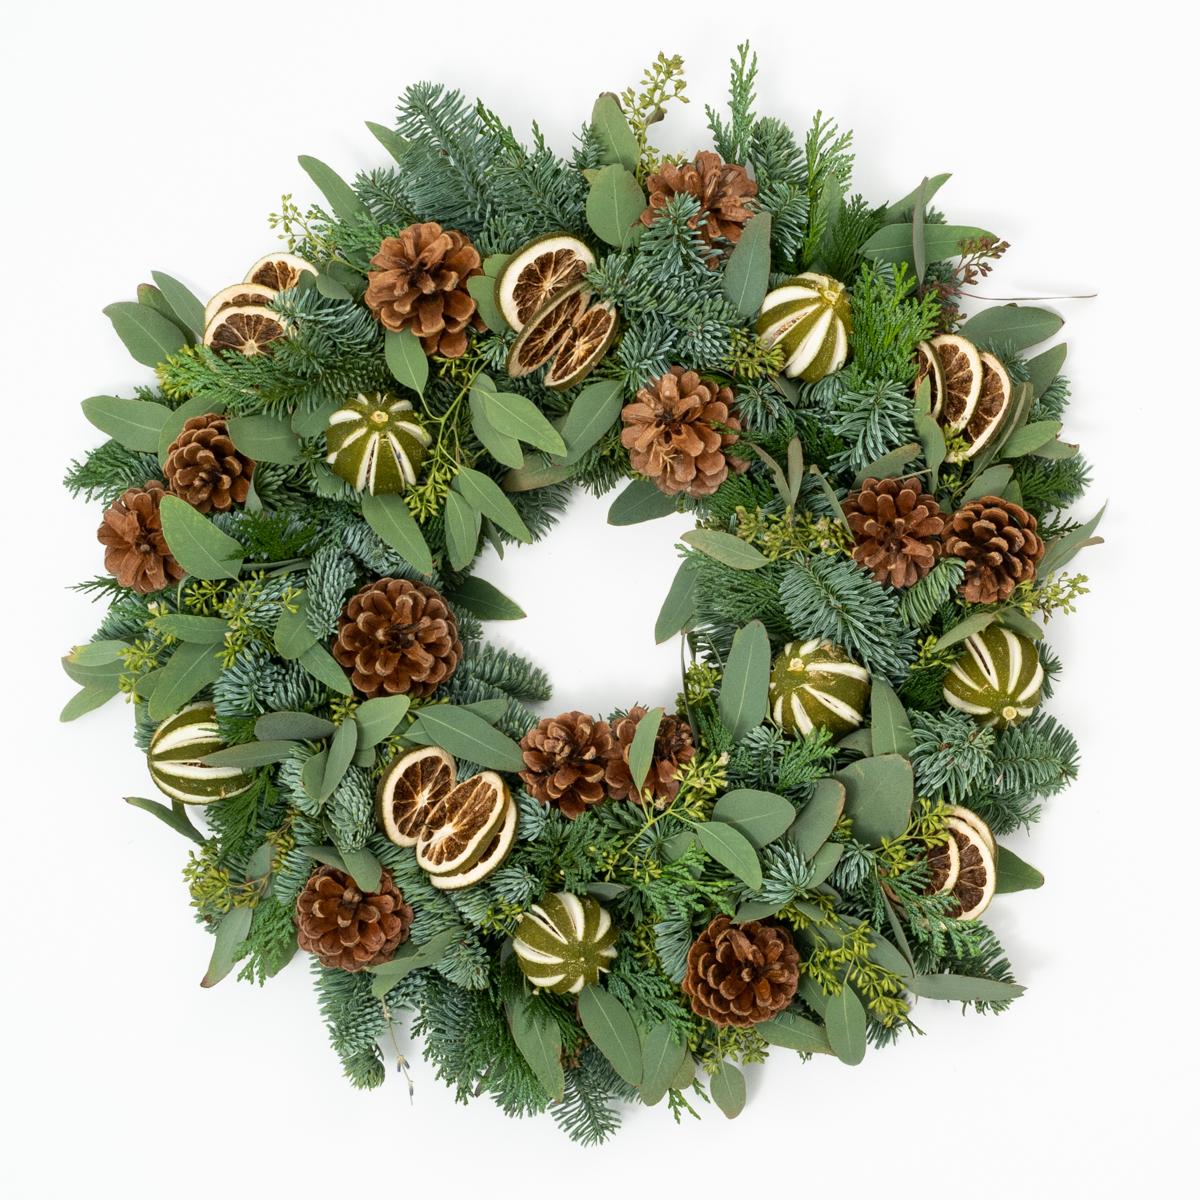 Bloom Flower Delivery | DIY Wreath Kit - Mulled Winter